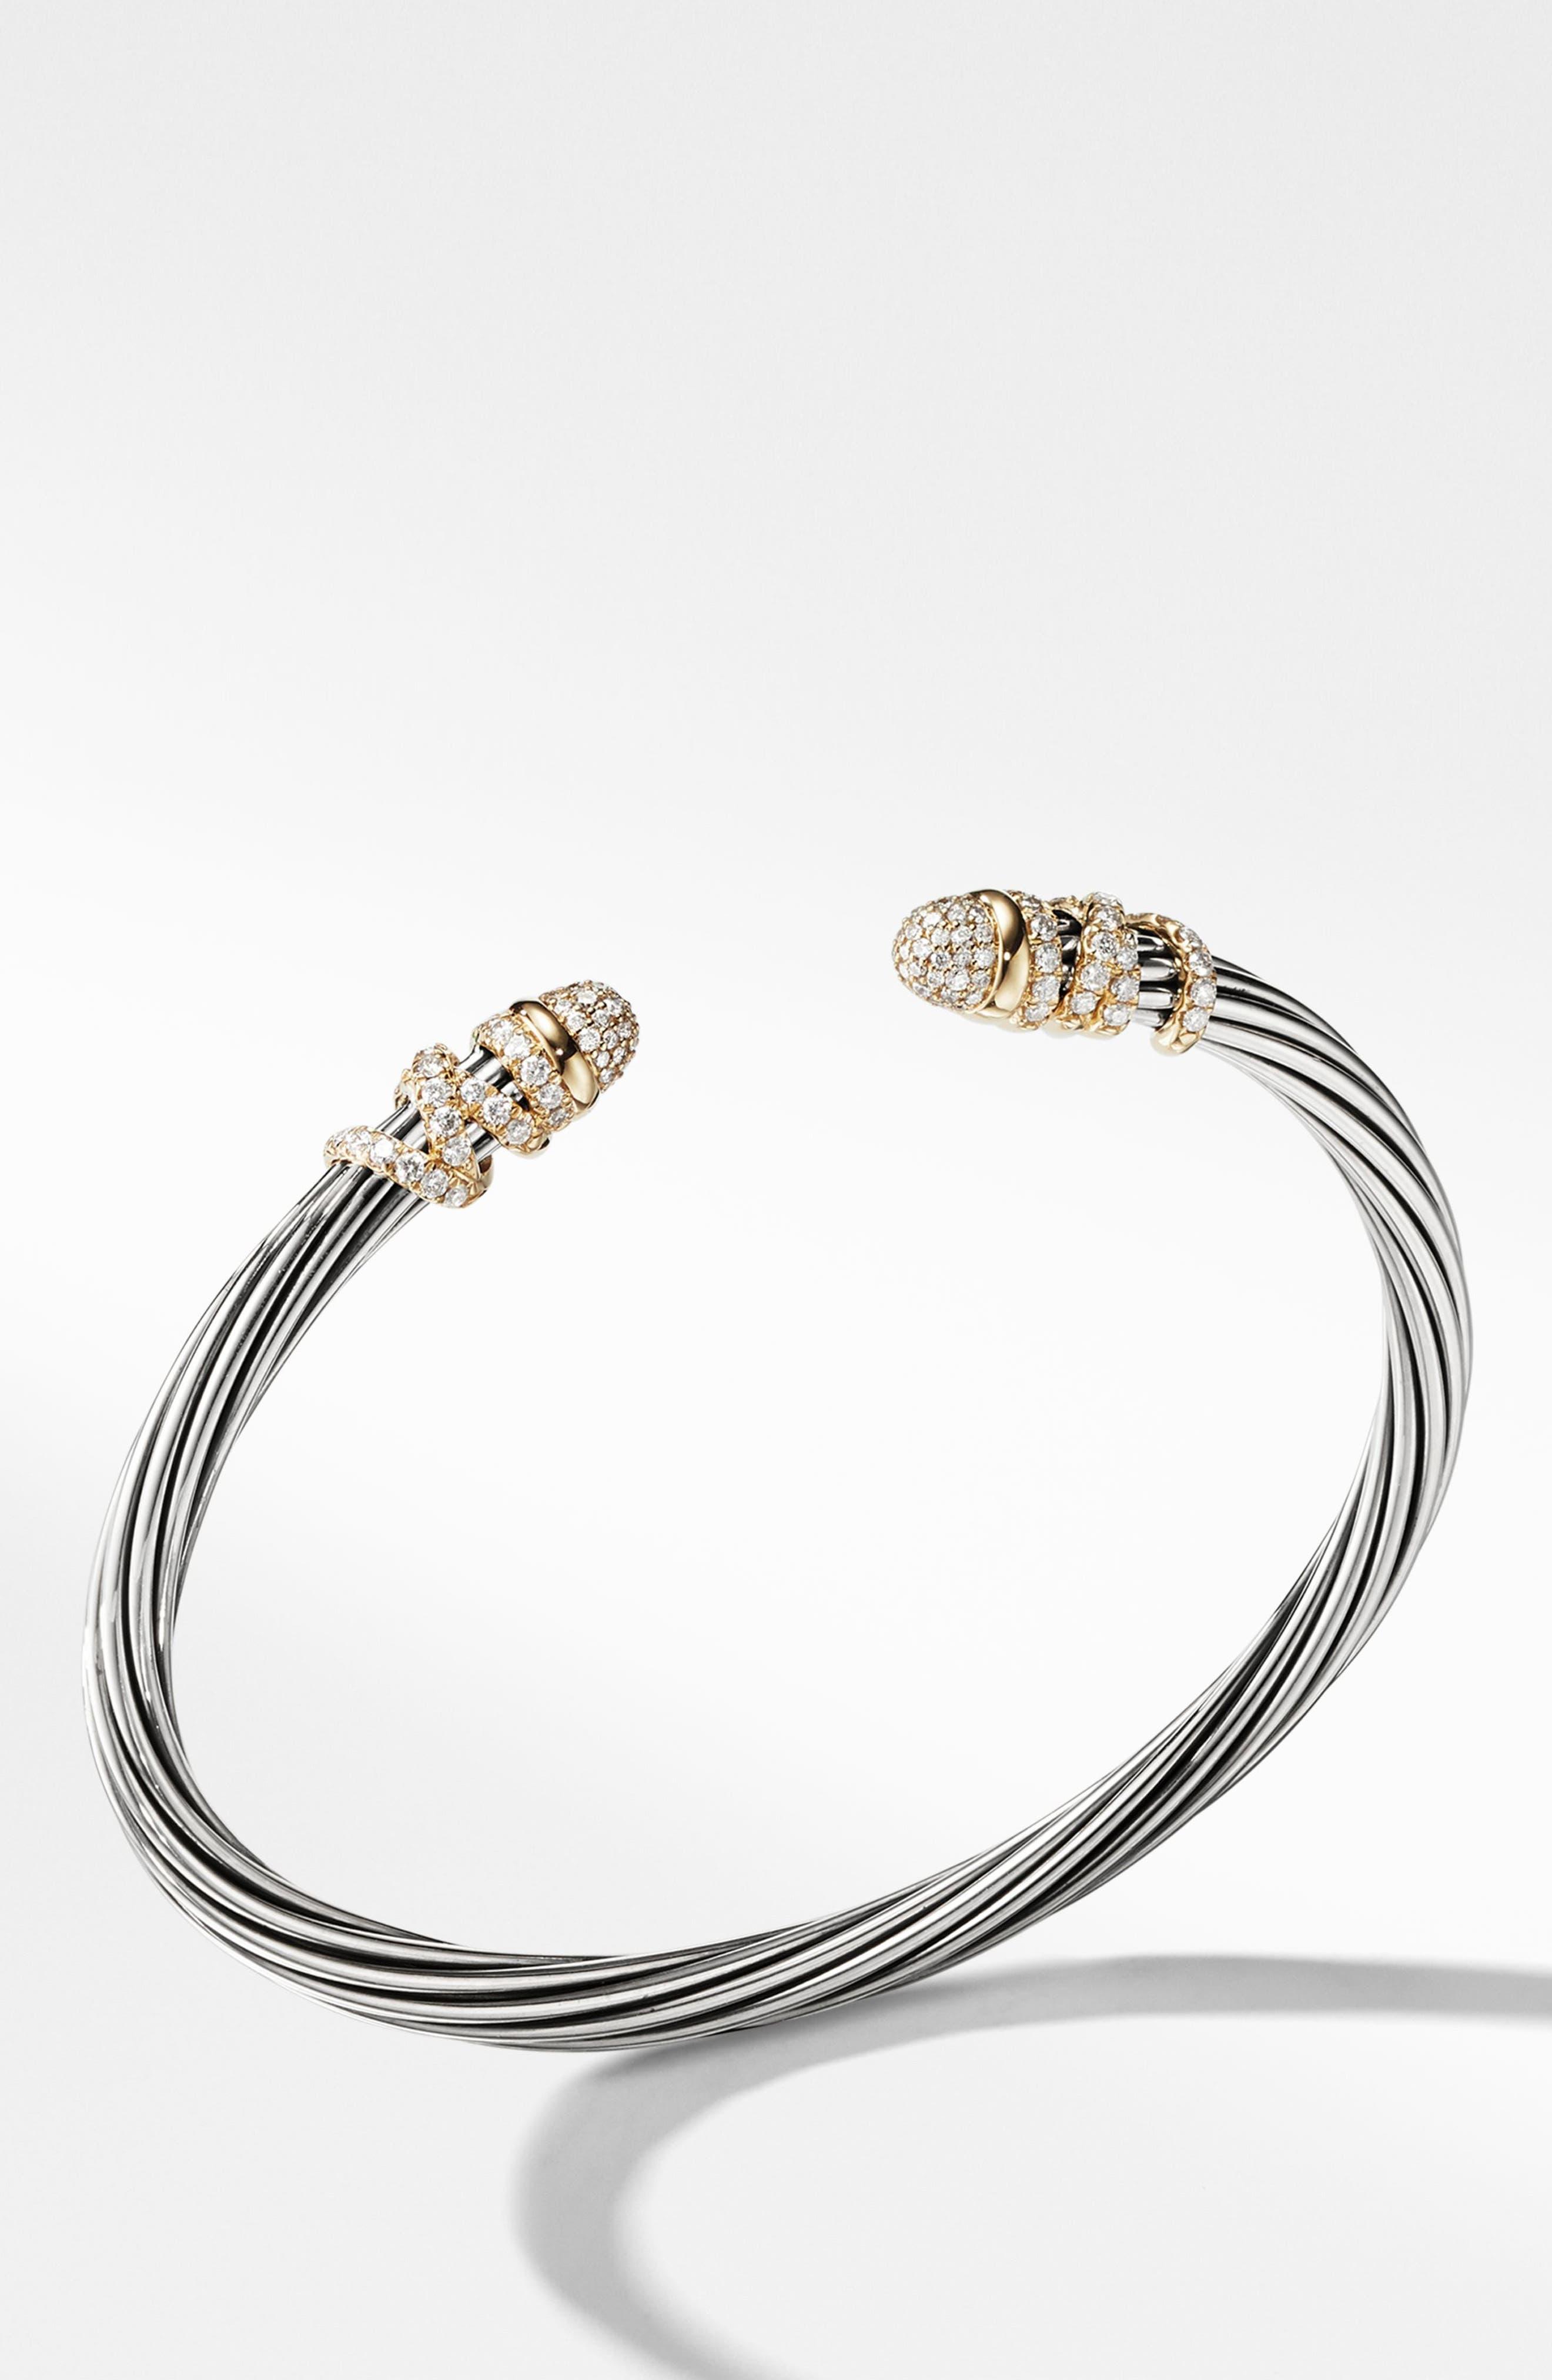 Helena Bracelet with Diamonds,                             Alternate thumbnail 2, color,                             GOLD/ SILVER/ DIAMOND